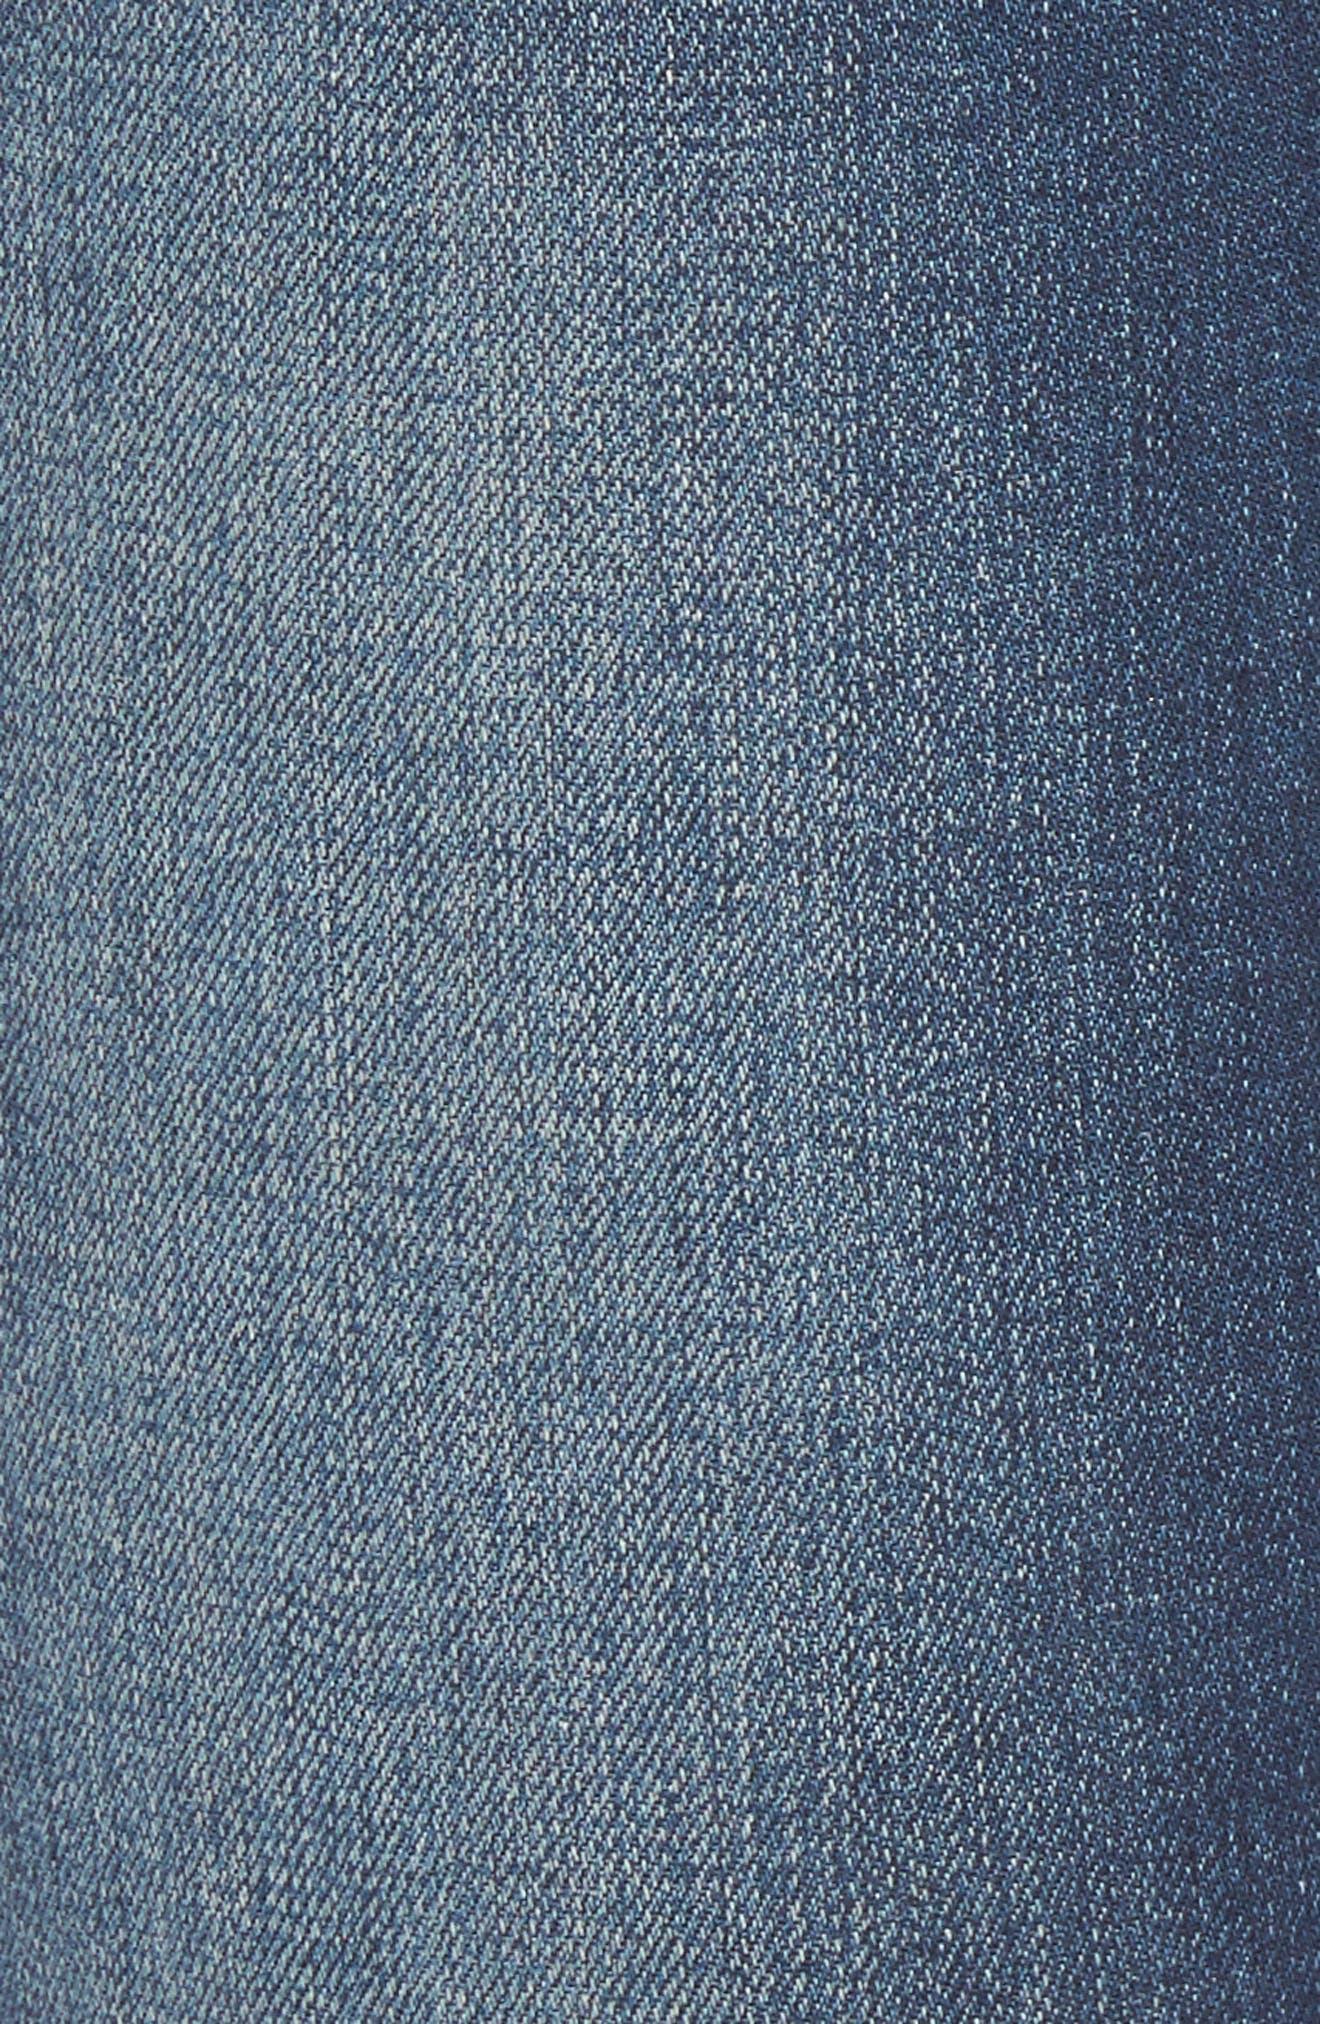 Piper Foil Crop Skinny Jeans,                             Alternate thumbnail 5, color,                             400